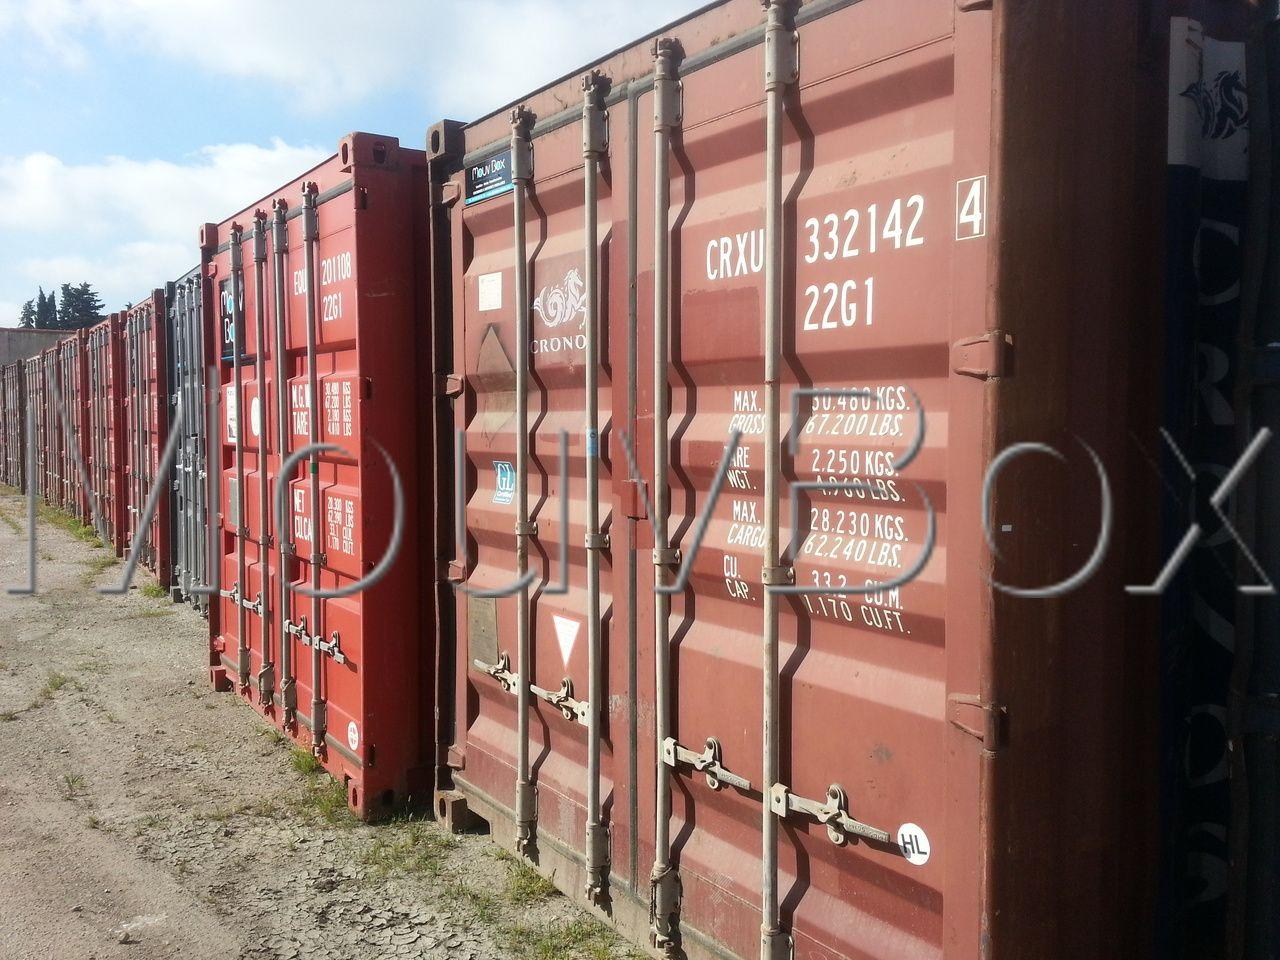 crxu3321424-container-conteneur-20ft-dry-occasion-vente-mouvbox